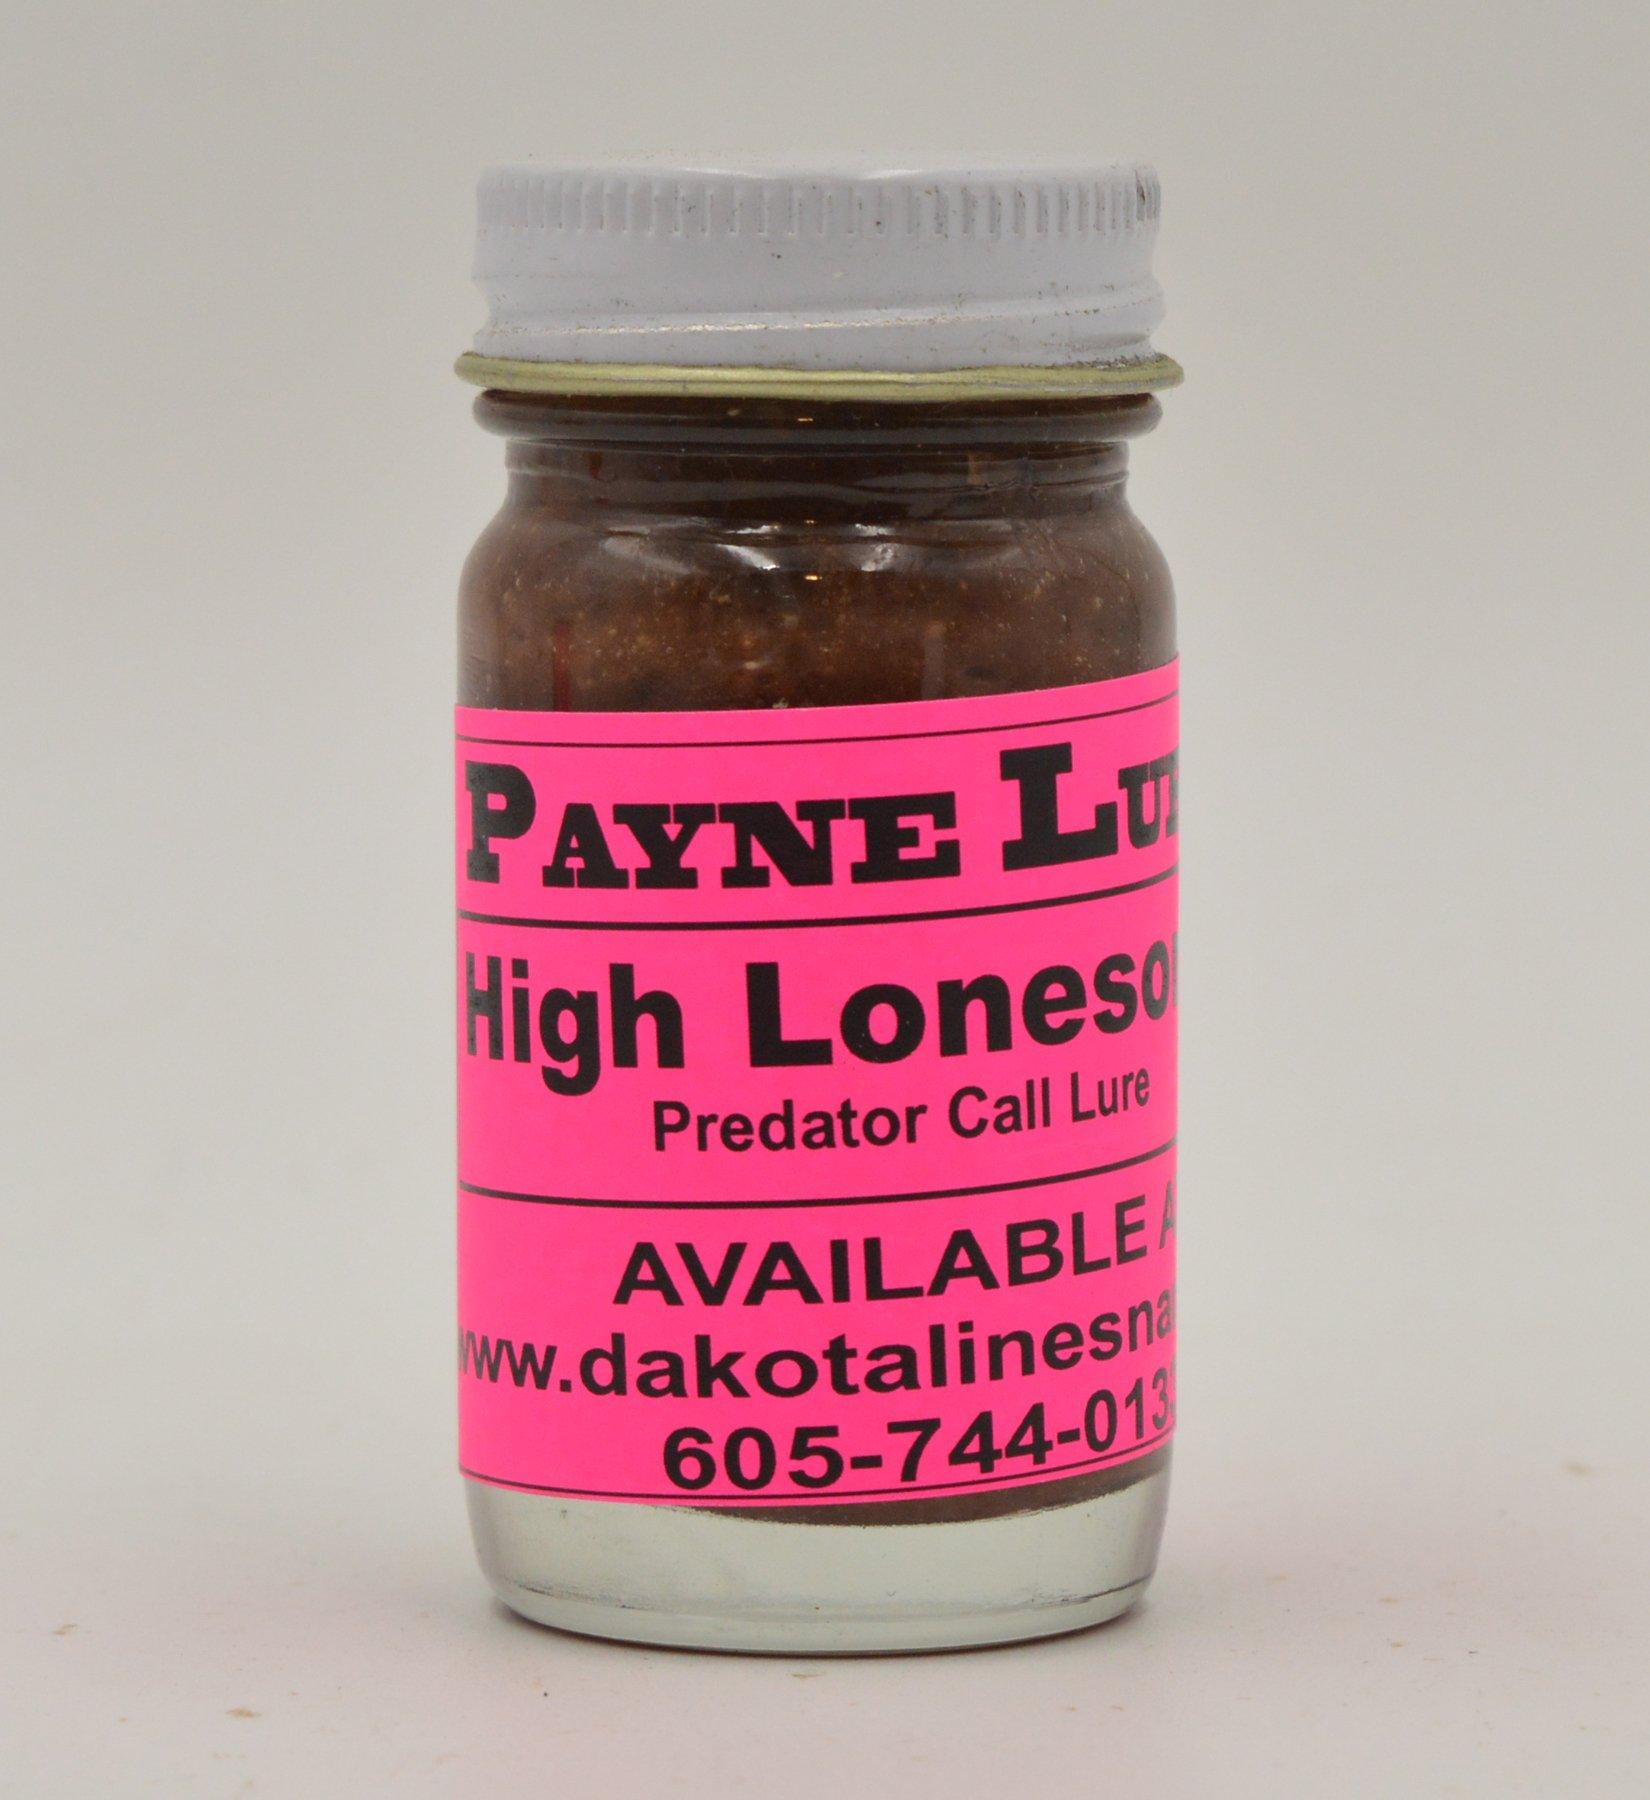 1 - 1 oz. Payne HIGH LONESOME Predator Call Lure